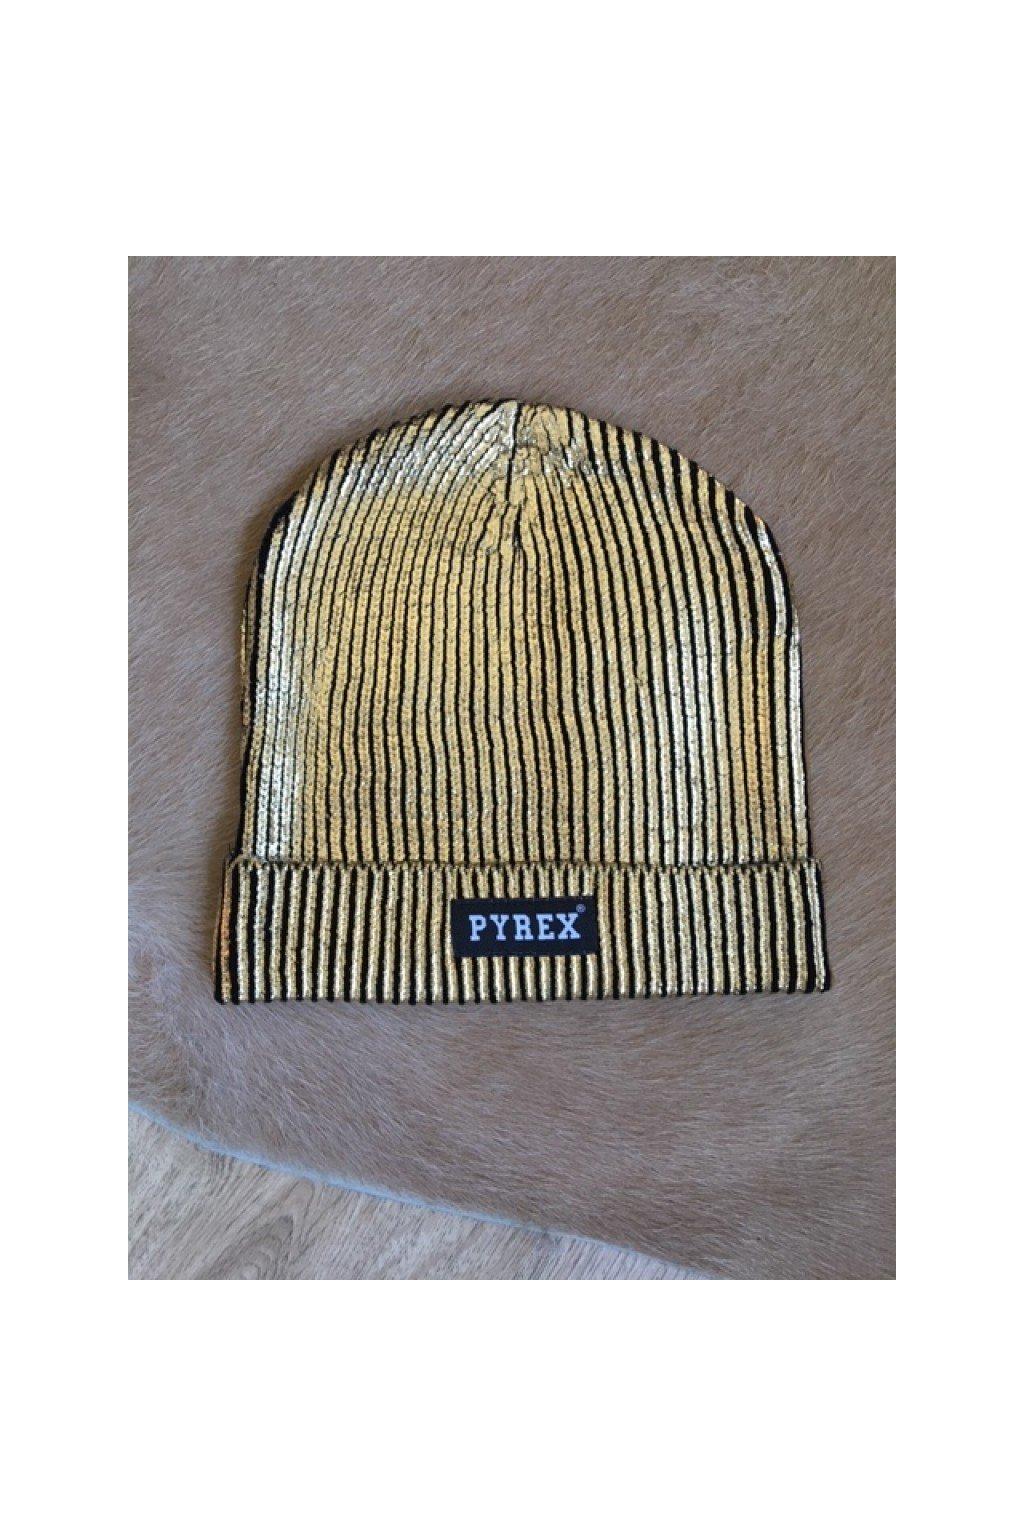 Čepice Pyrex lesklá - zlatá (Velikost Velikost UNI)